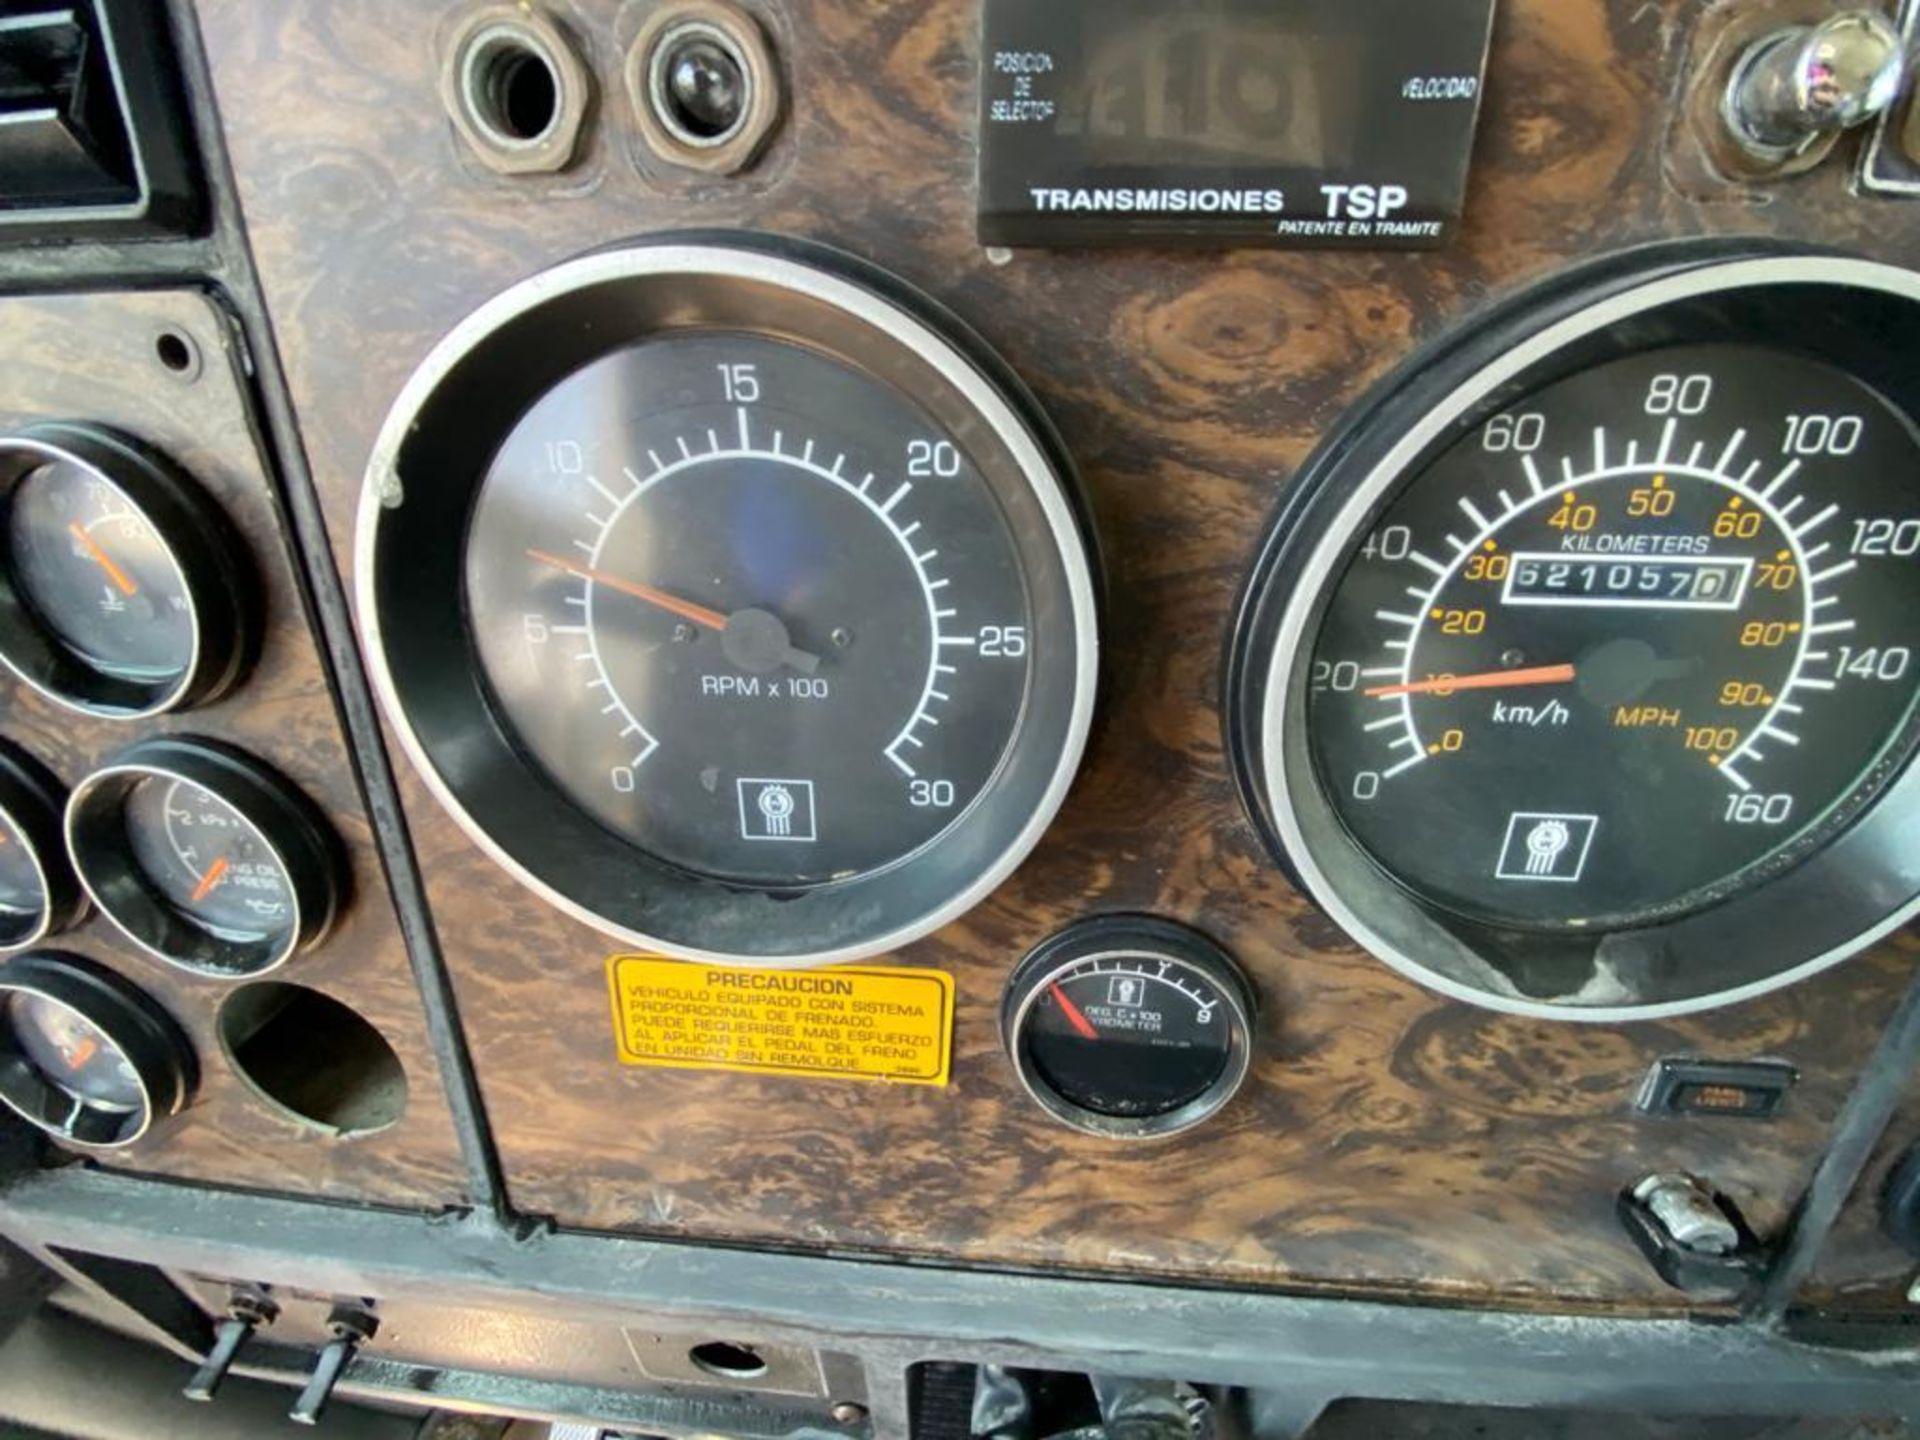 1998 Kenworth 5000 Gallon, standard transmission of 16 speeds - Image 32 of 68